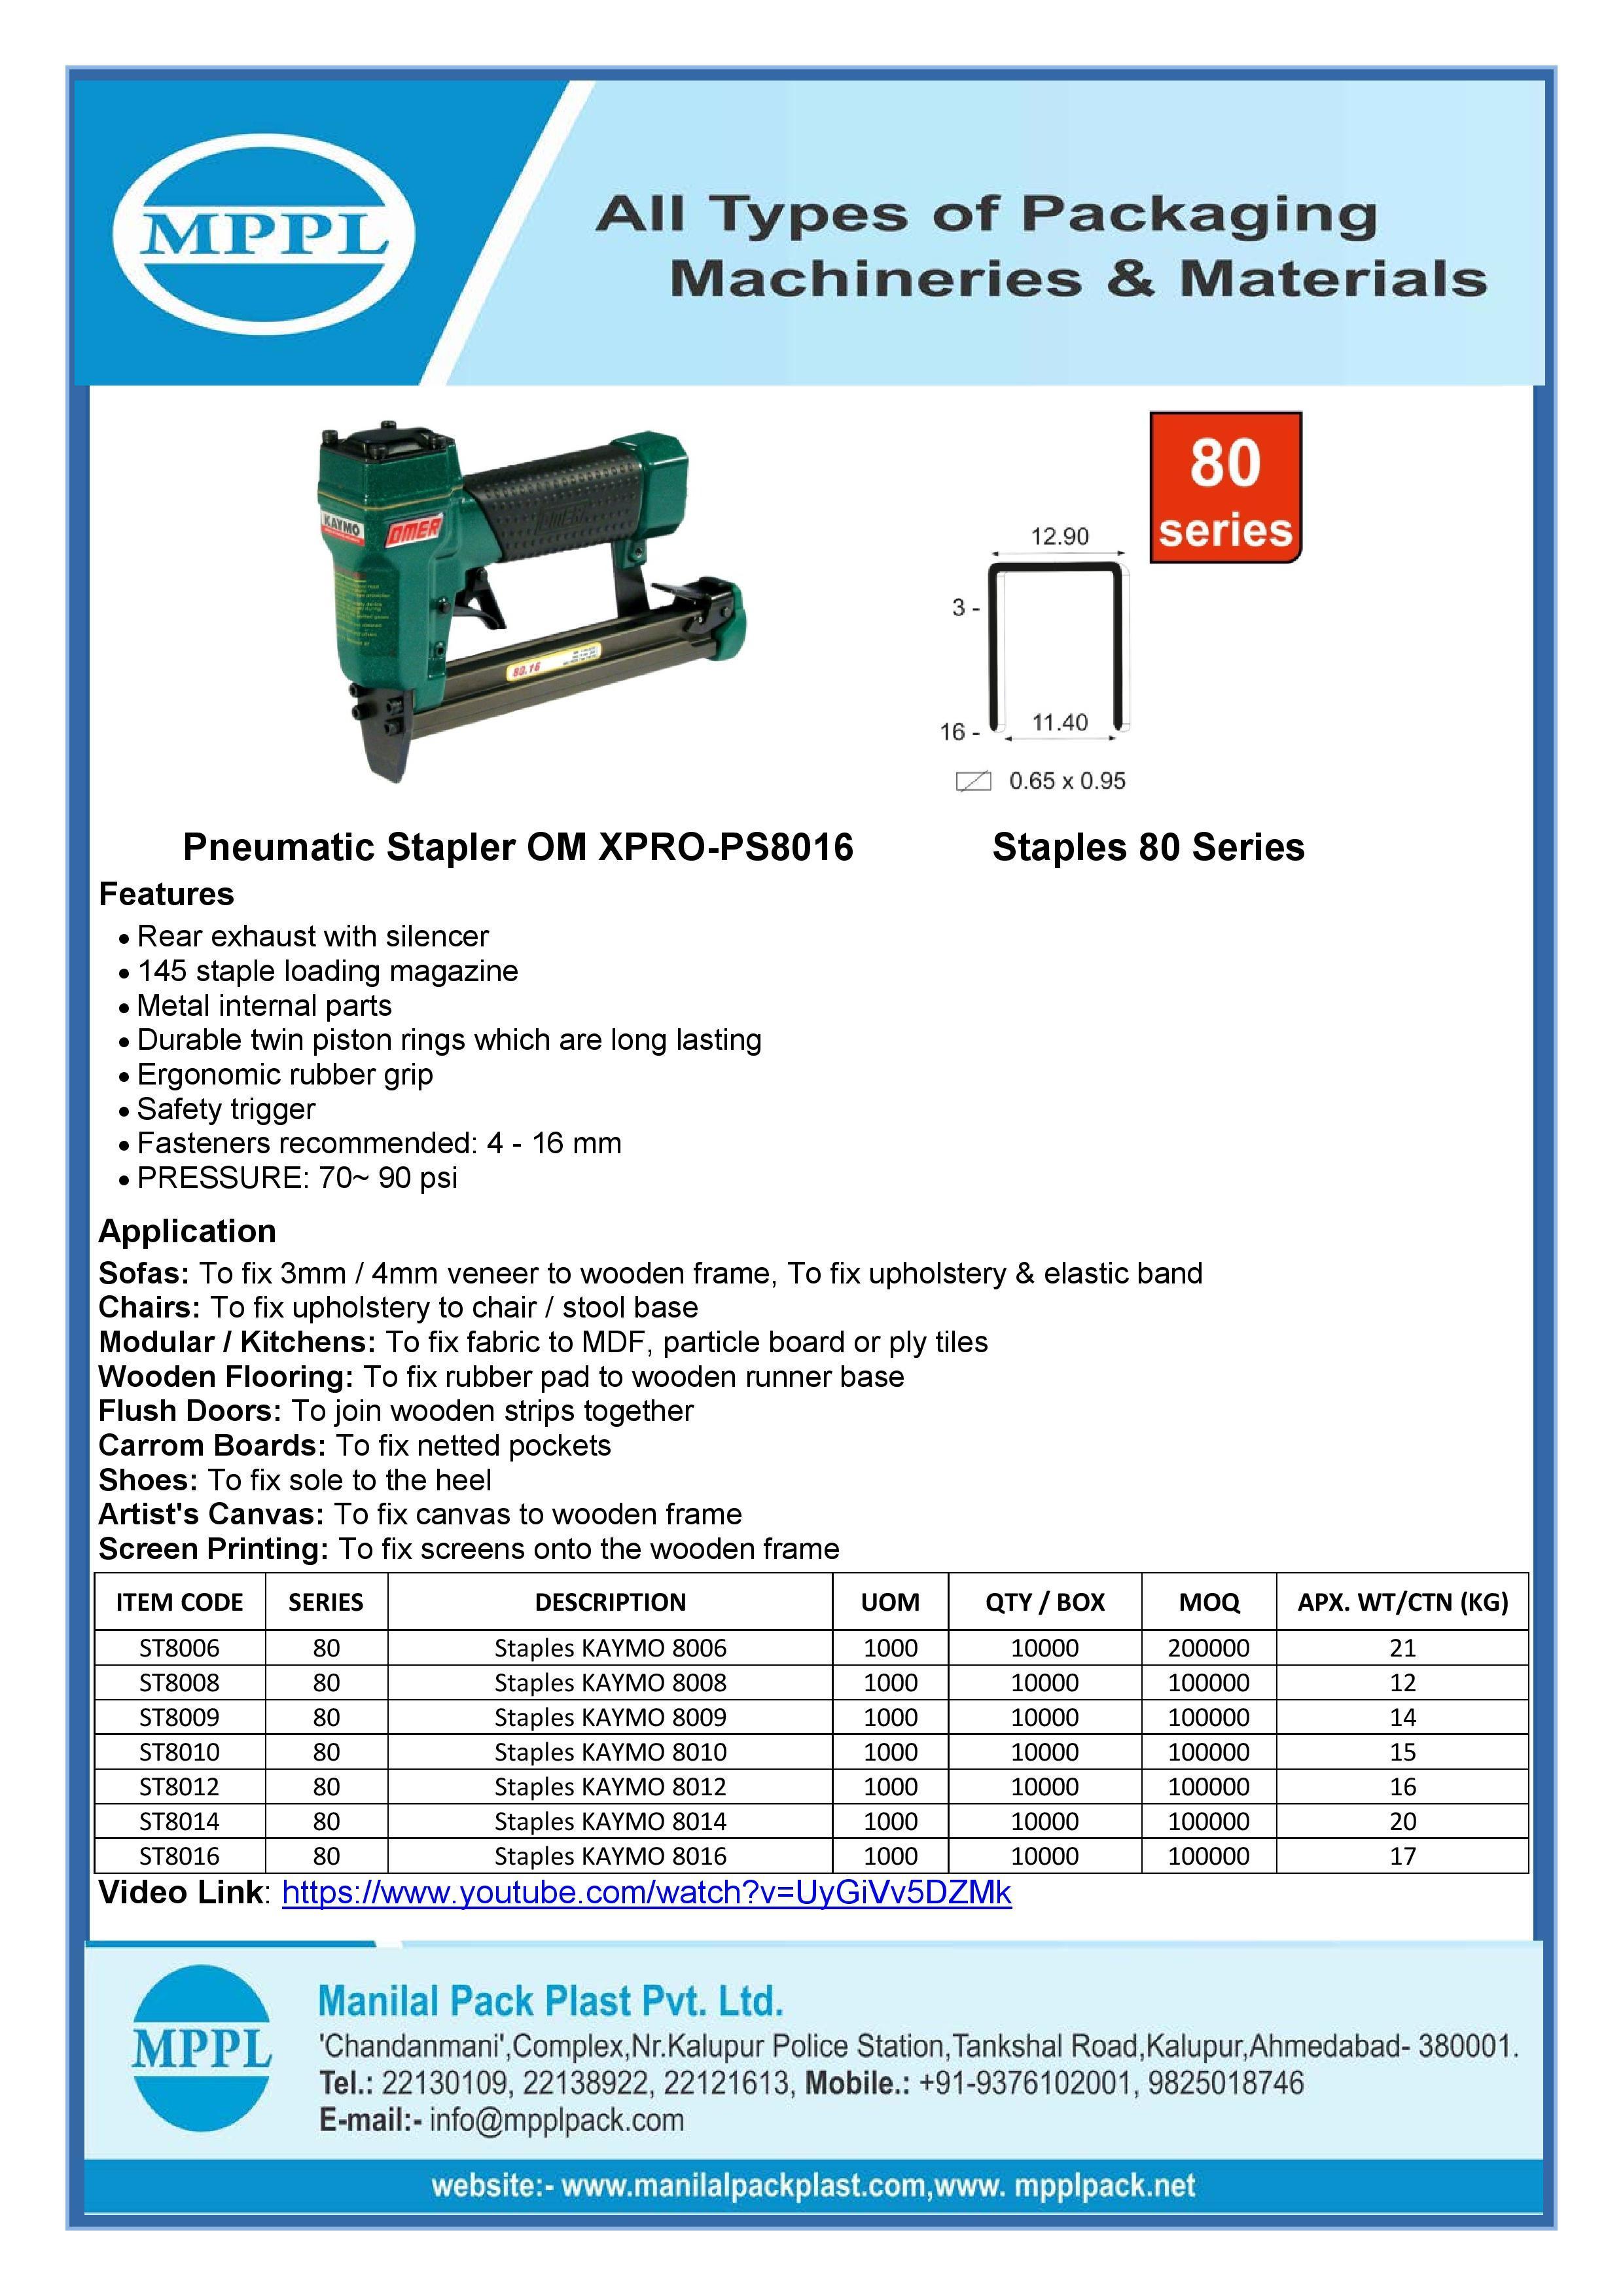 Pneumatic Stapler OM XPRO-PS8016